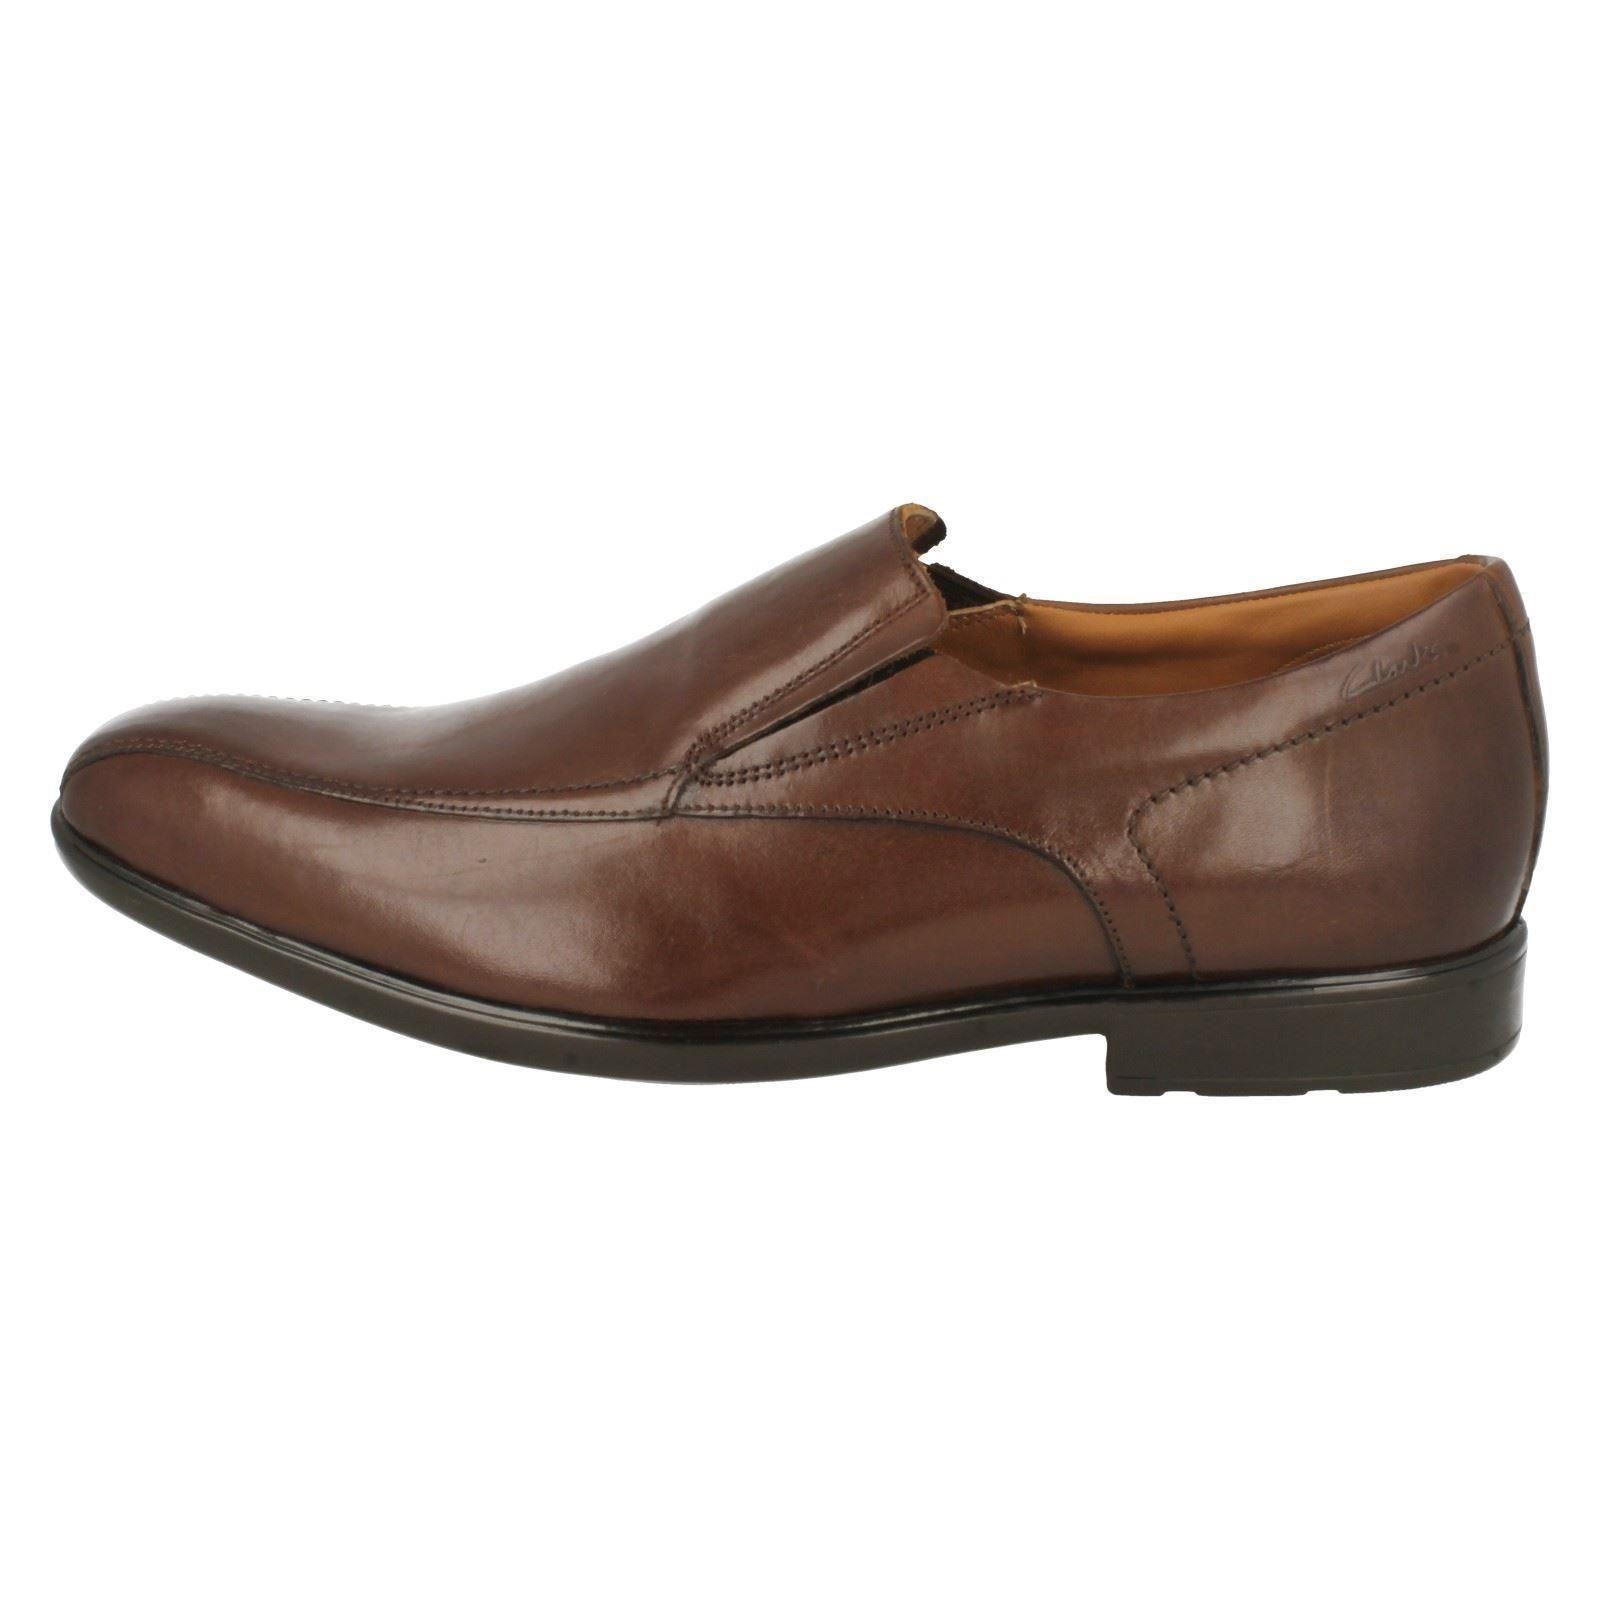 Uomo 'Gosworth Clarks Slip On Schuhes 'Gosworth Uomo Step' f4979c